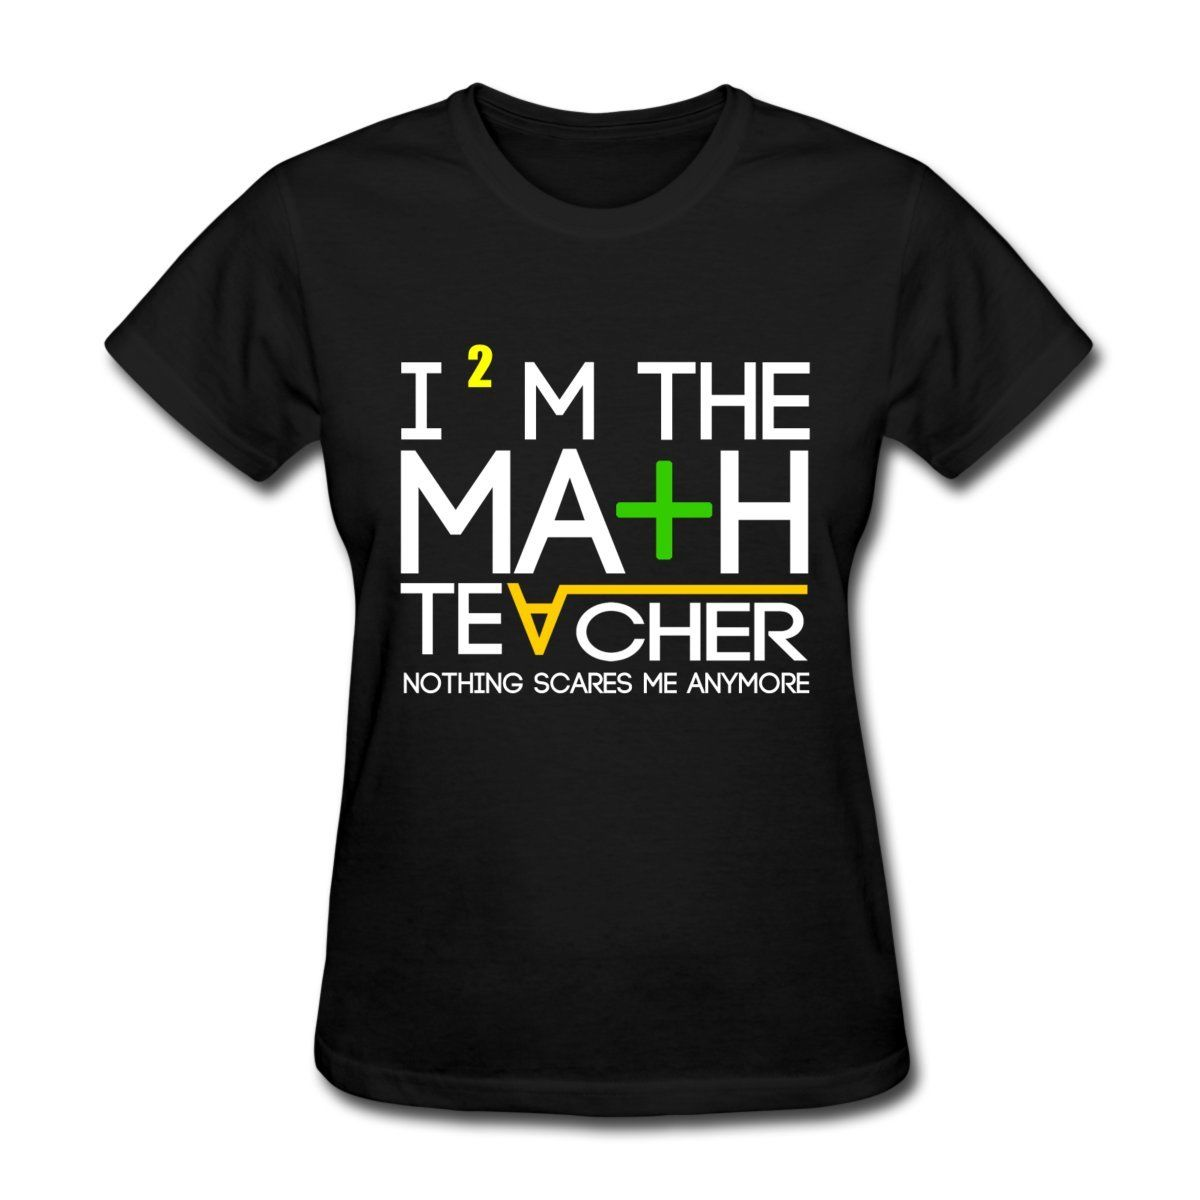 Camiseta divertida con frase de profesor de matemáticas, camiseta de Fitness para mujeres, camisetas de culturismo para niñas, chándal divertido, ropa de Grunge para mujer